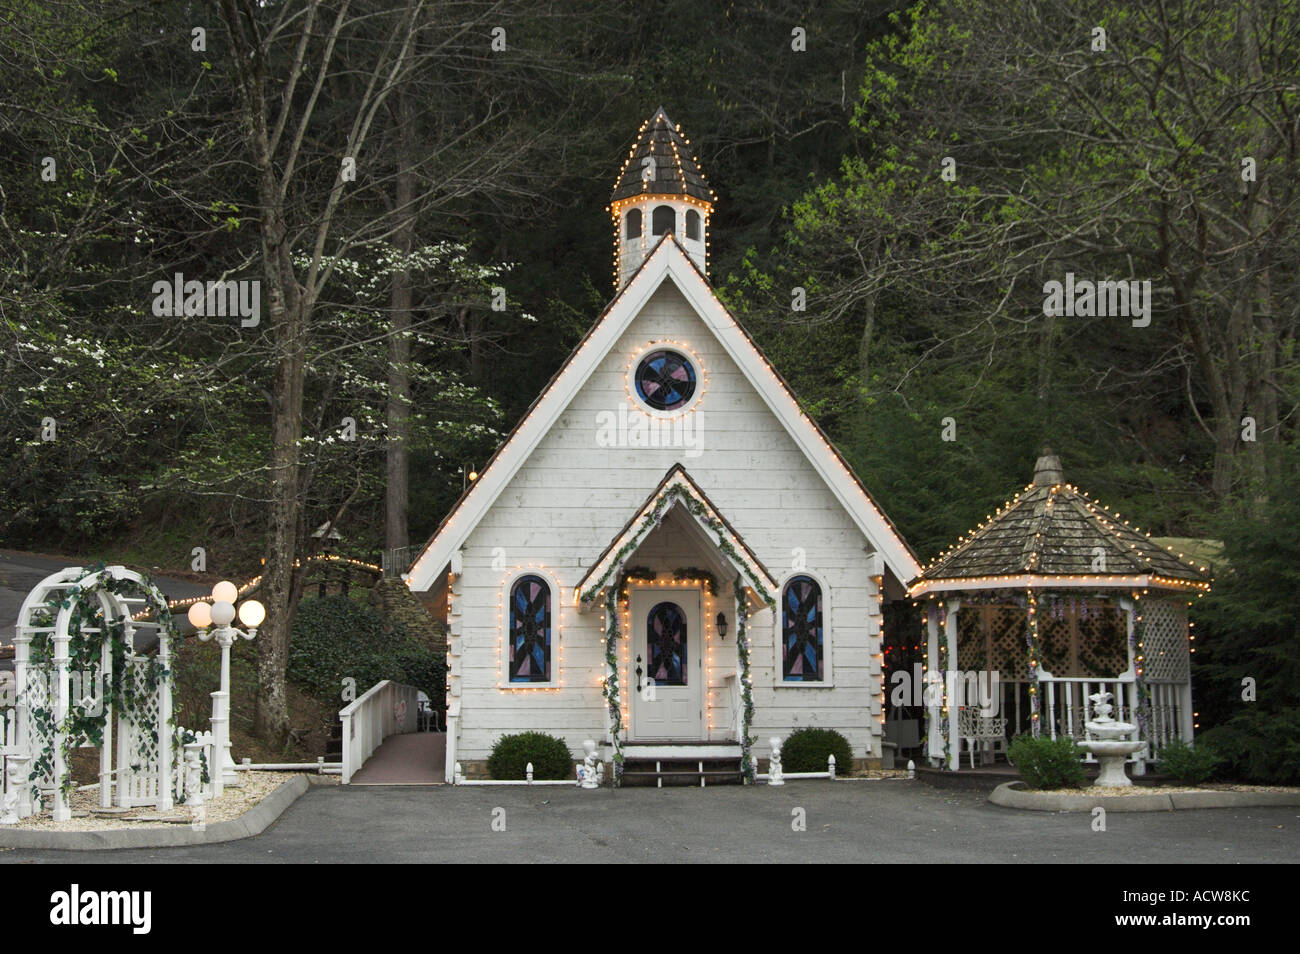 The Chapel Of Love Wedding In Gatlinburg Tennessee USA